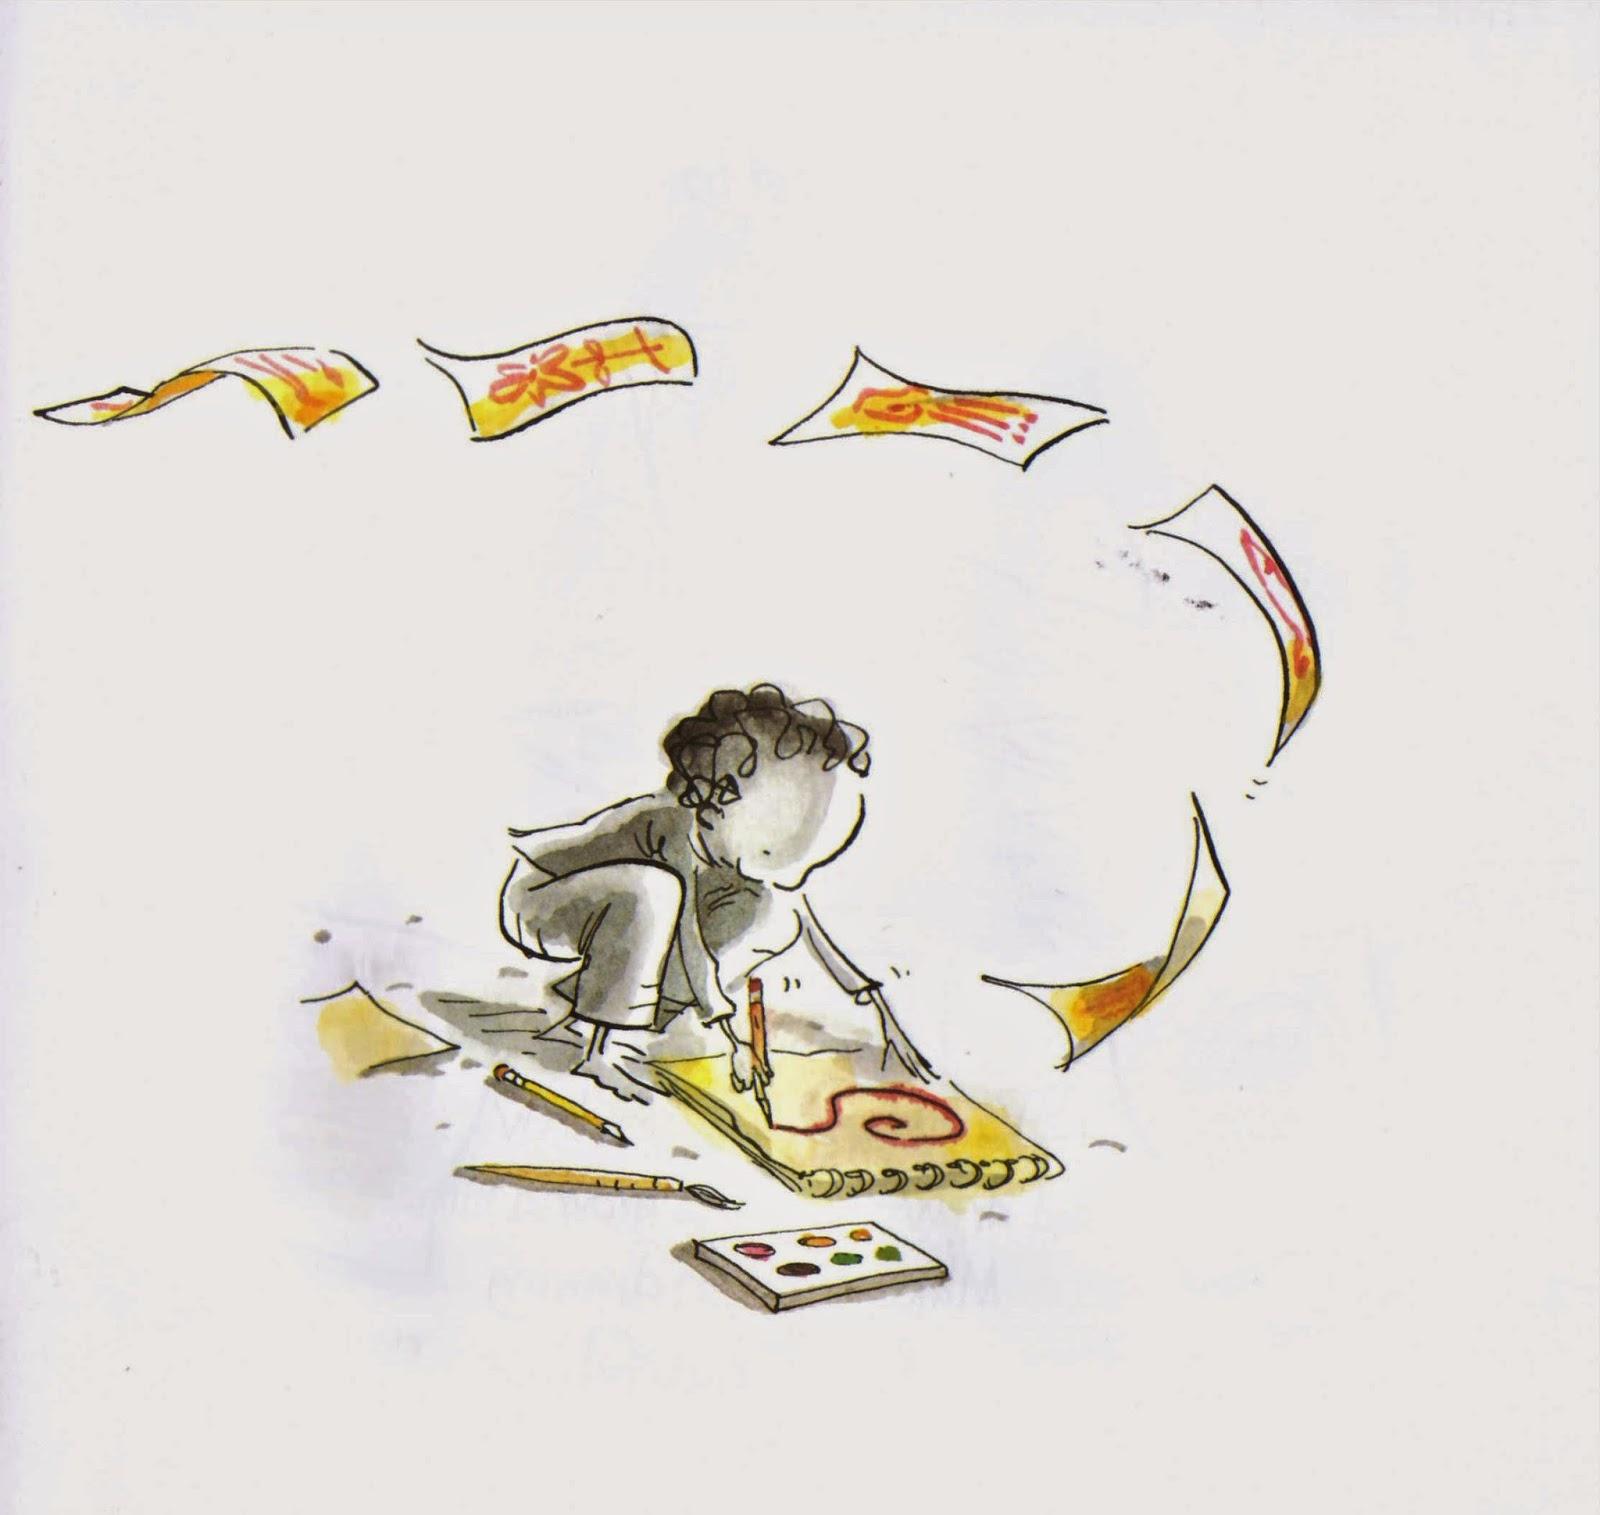 Illustration from Ish